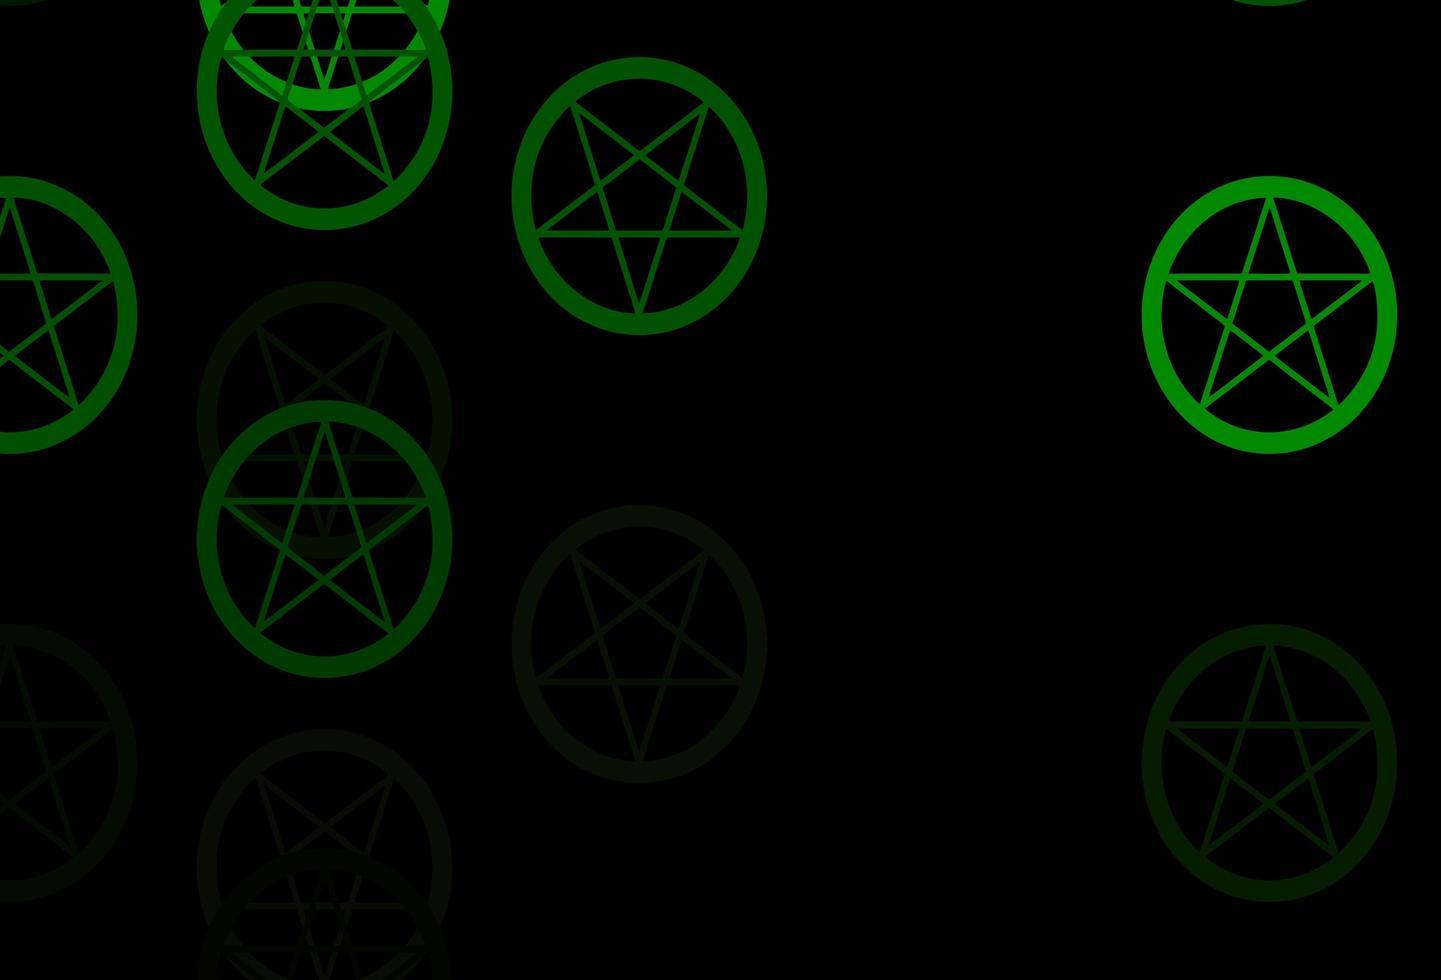 fond de vecteur vert foncé avec des symboles occultes.